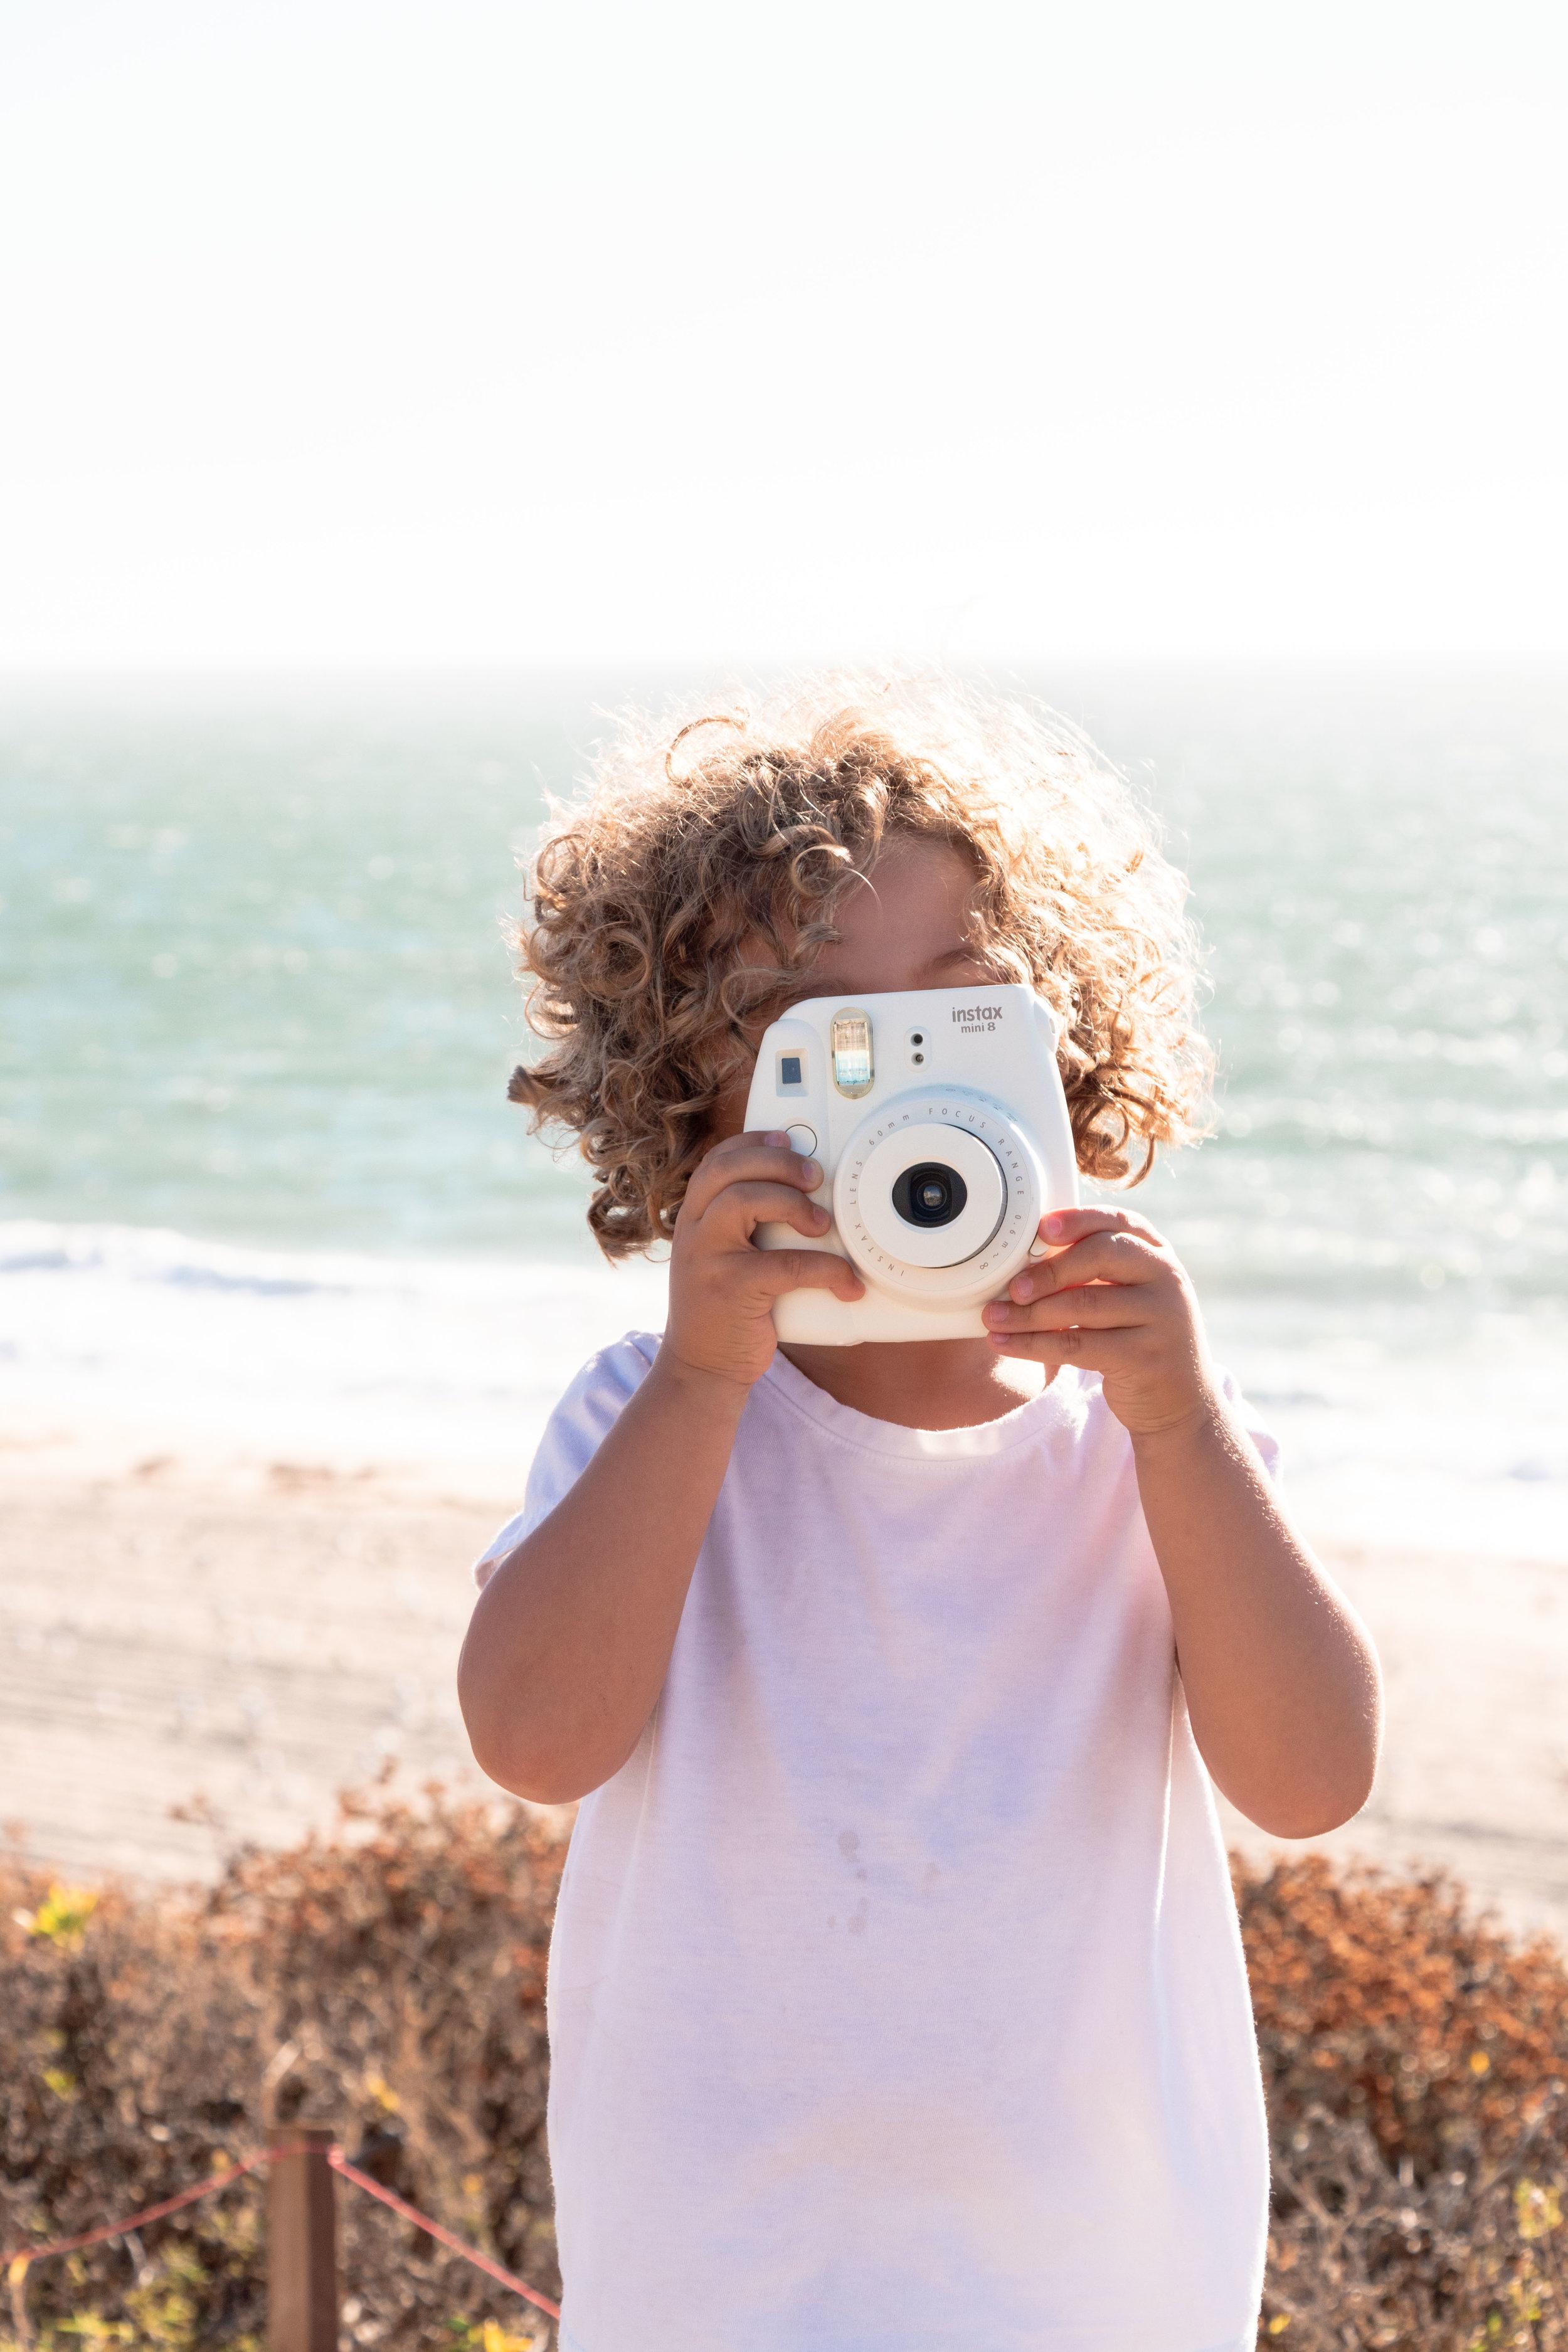 taking photos at the beach